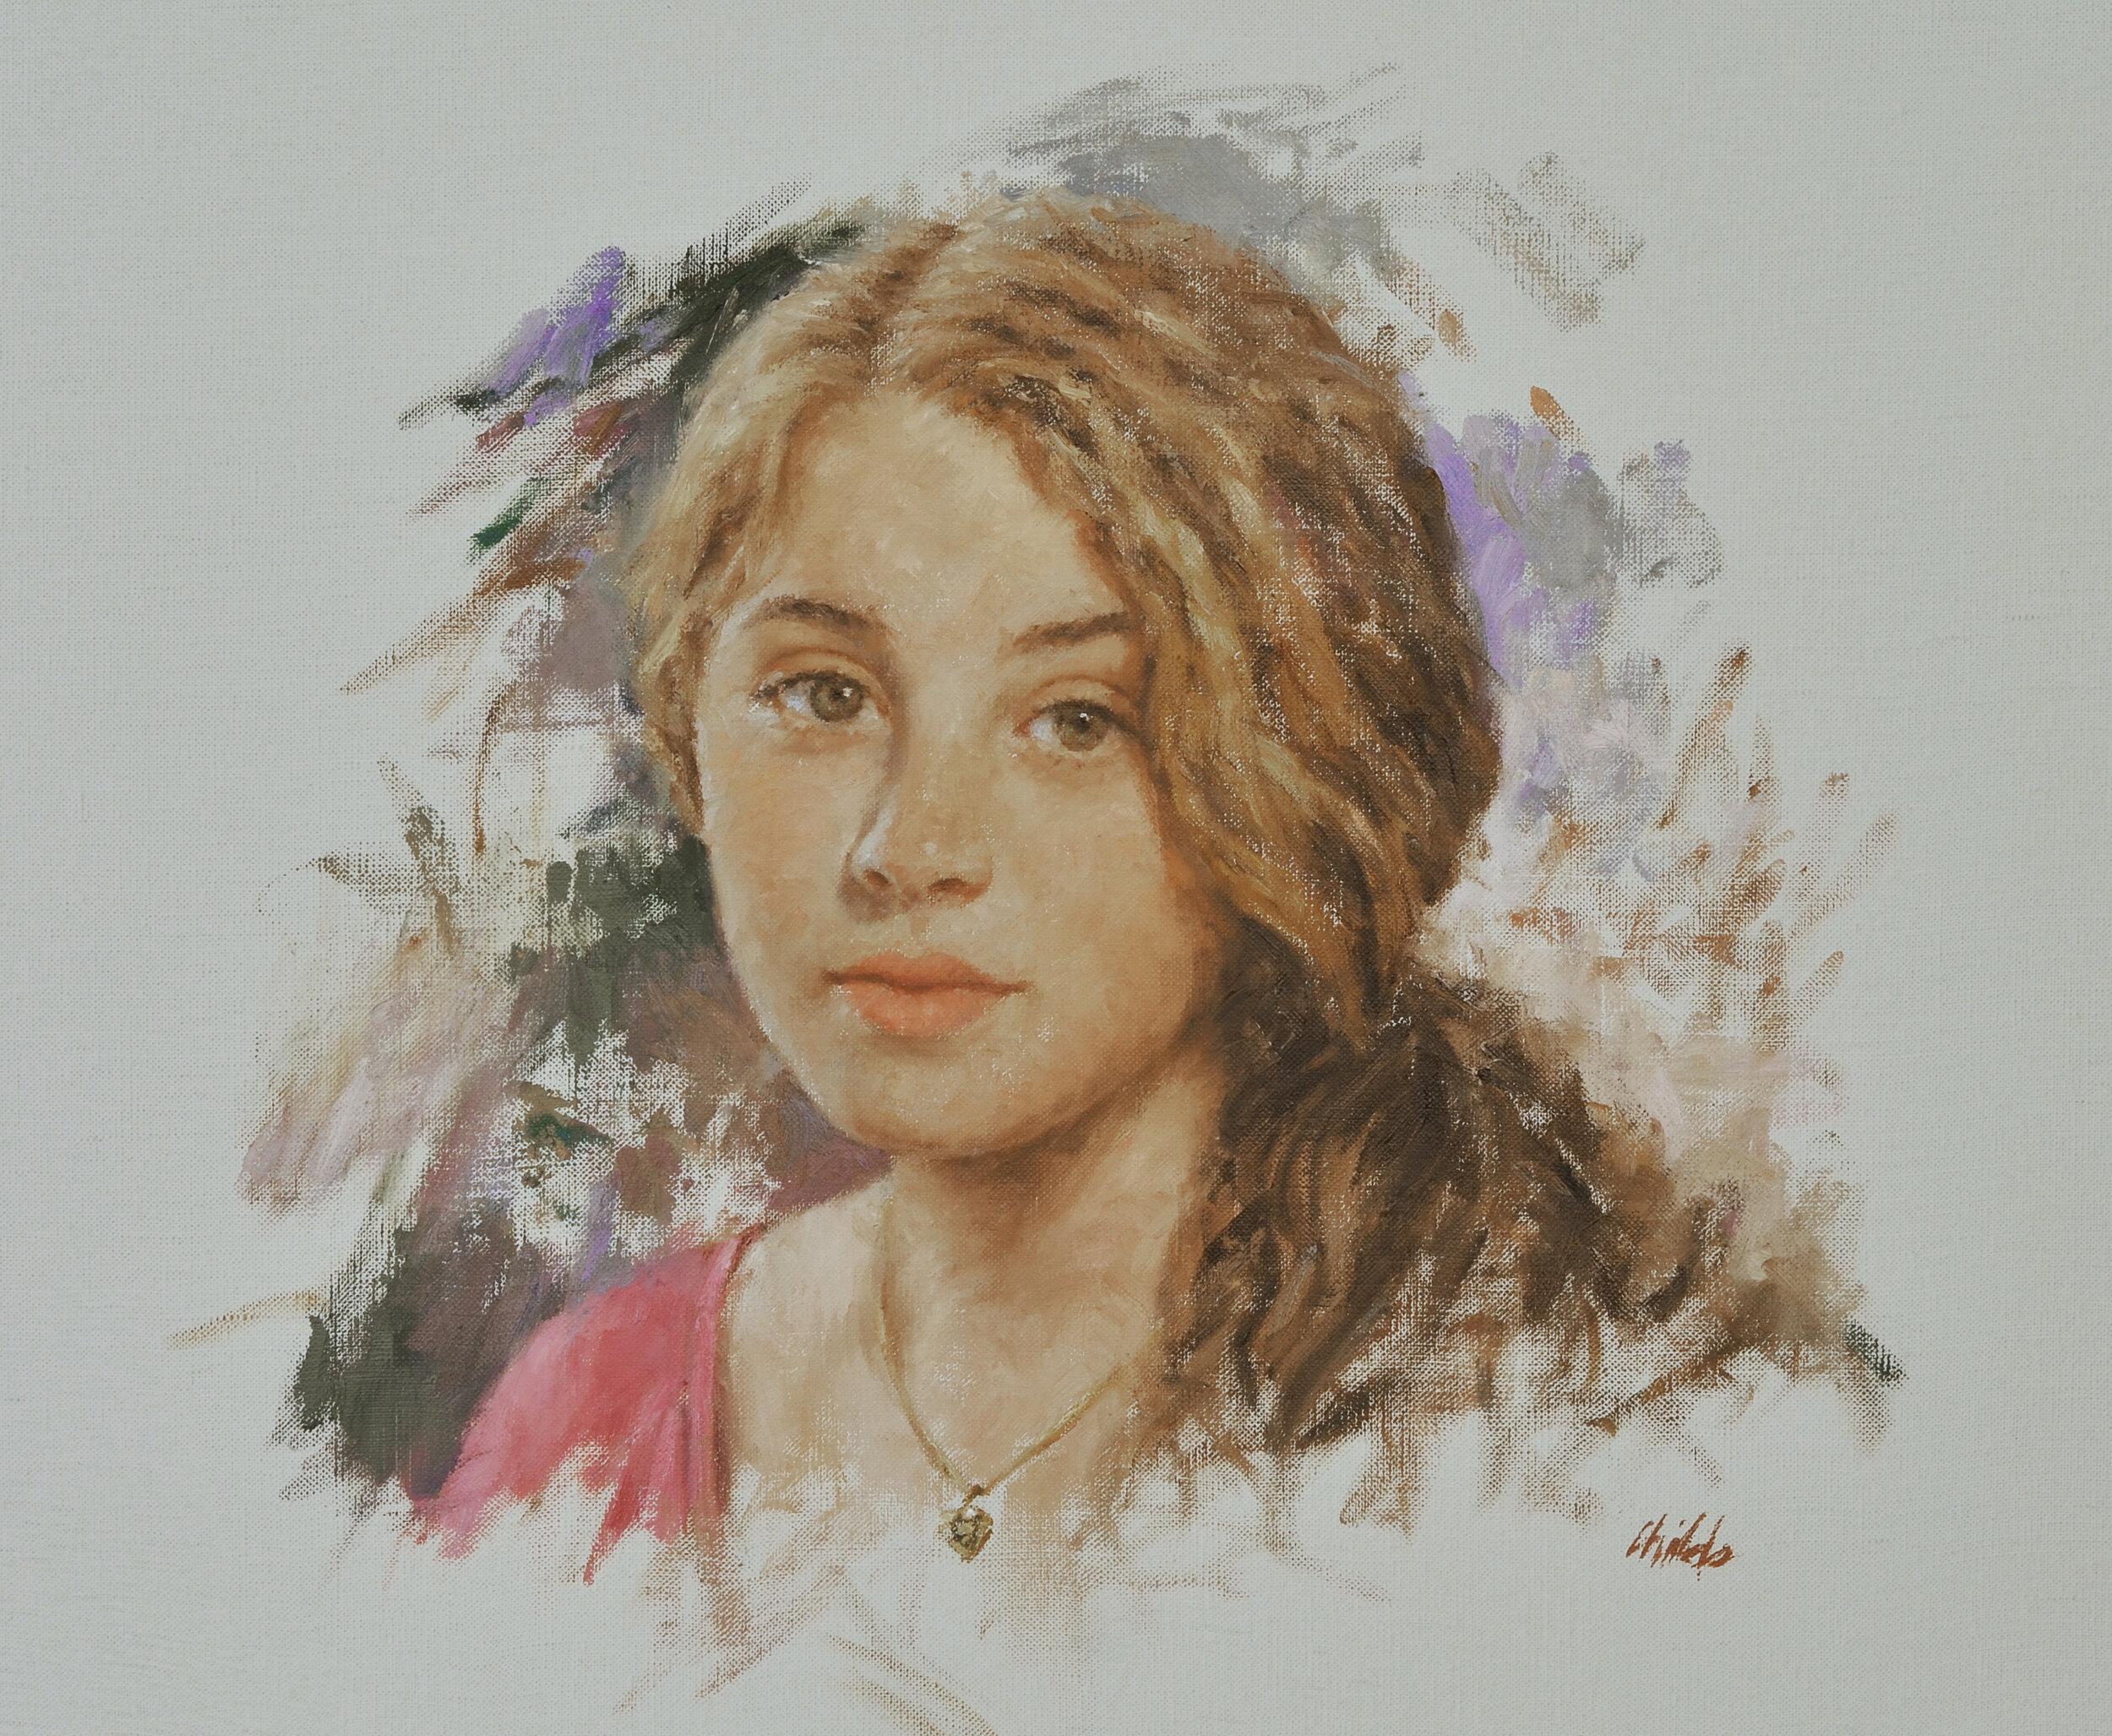 Lindsay Youssef portrait 16x20 #2 JGP.jpg